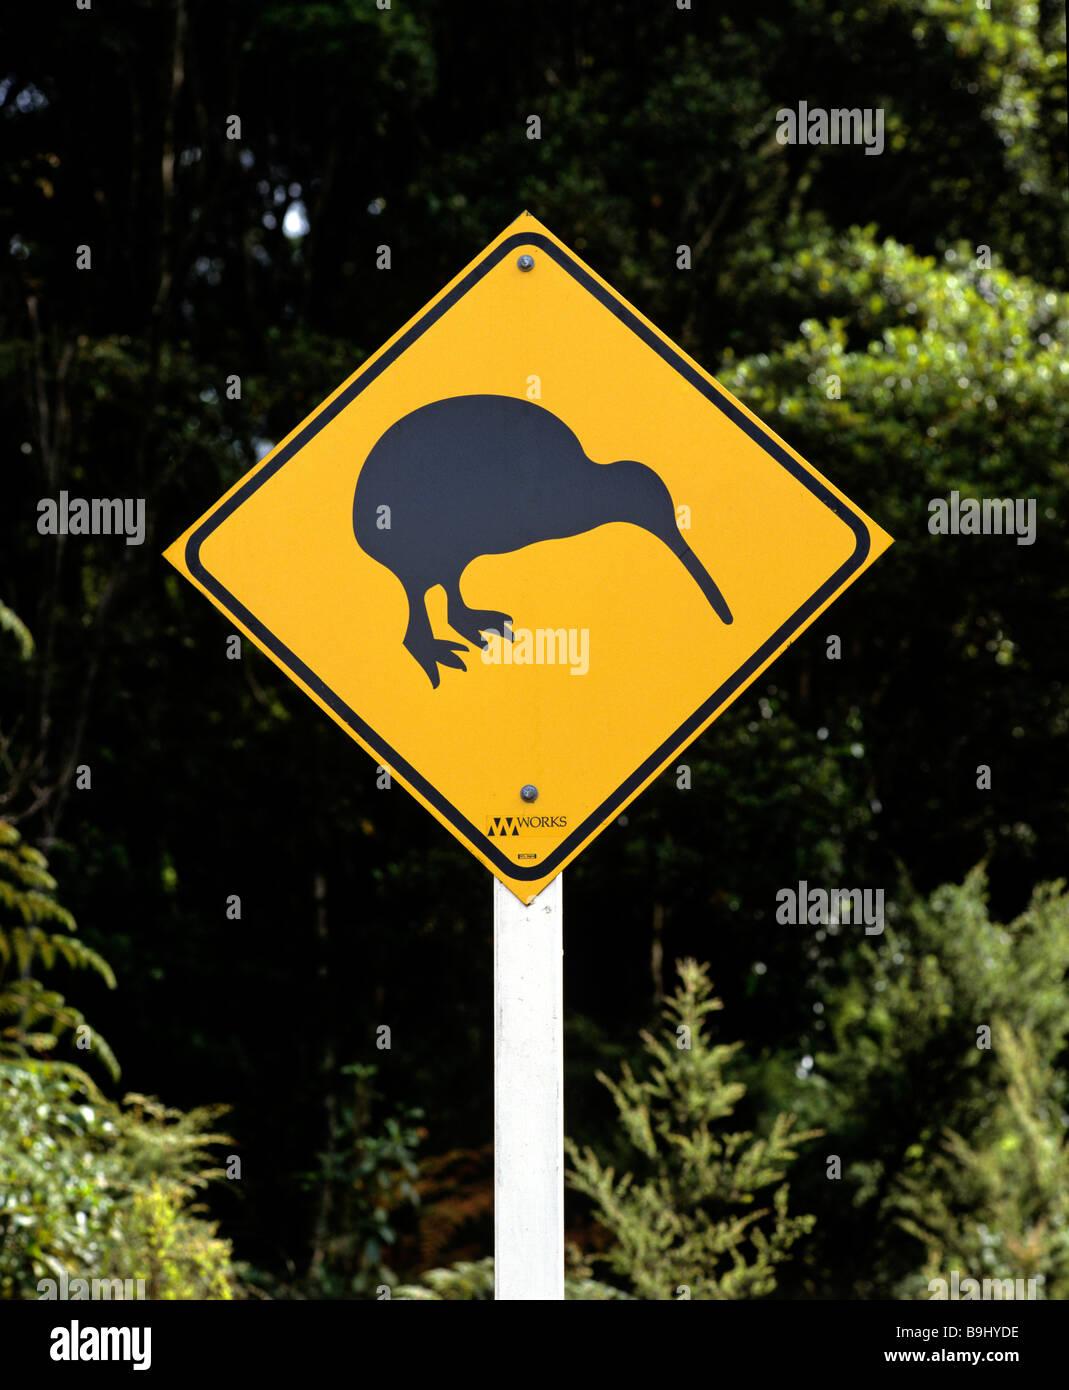 Kiwi-Schilder, Straßenschild, Neuseeland Stockbild